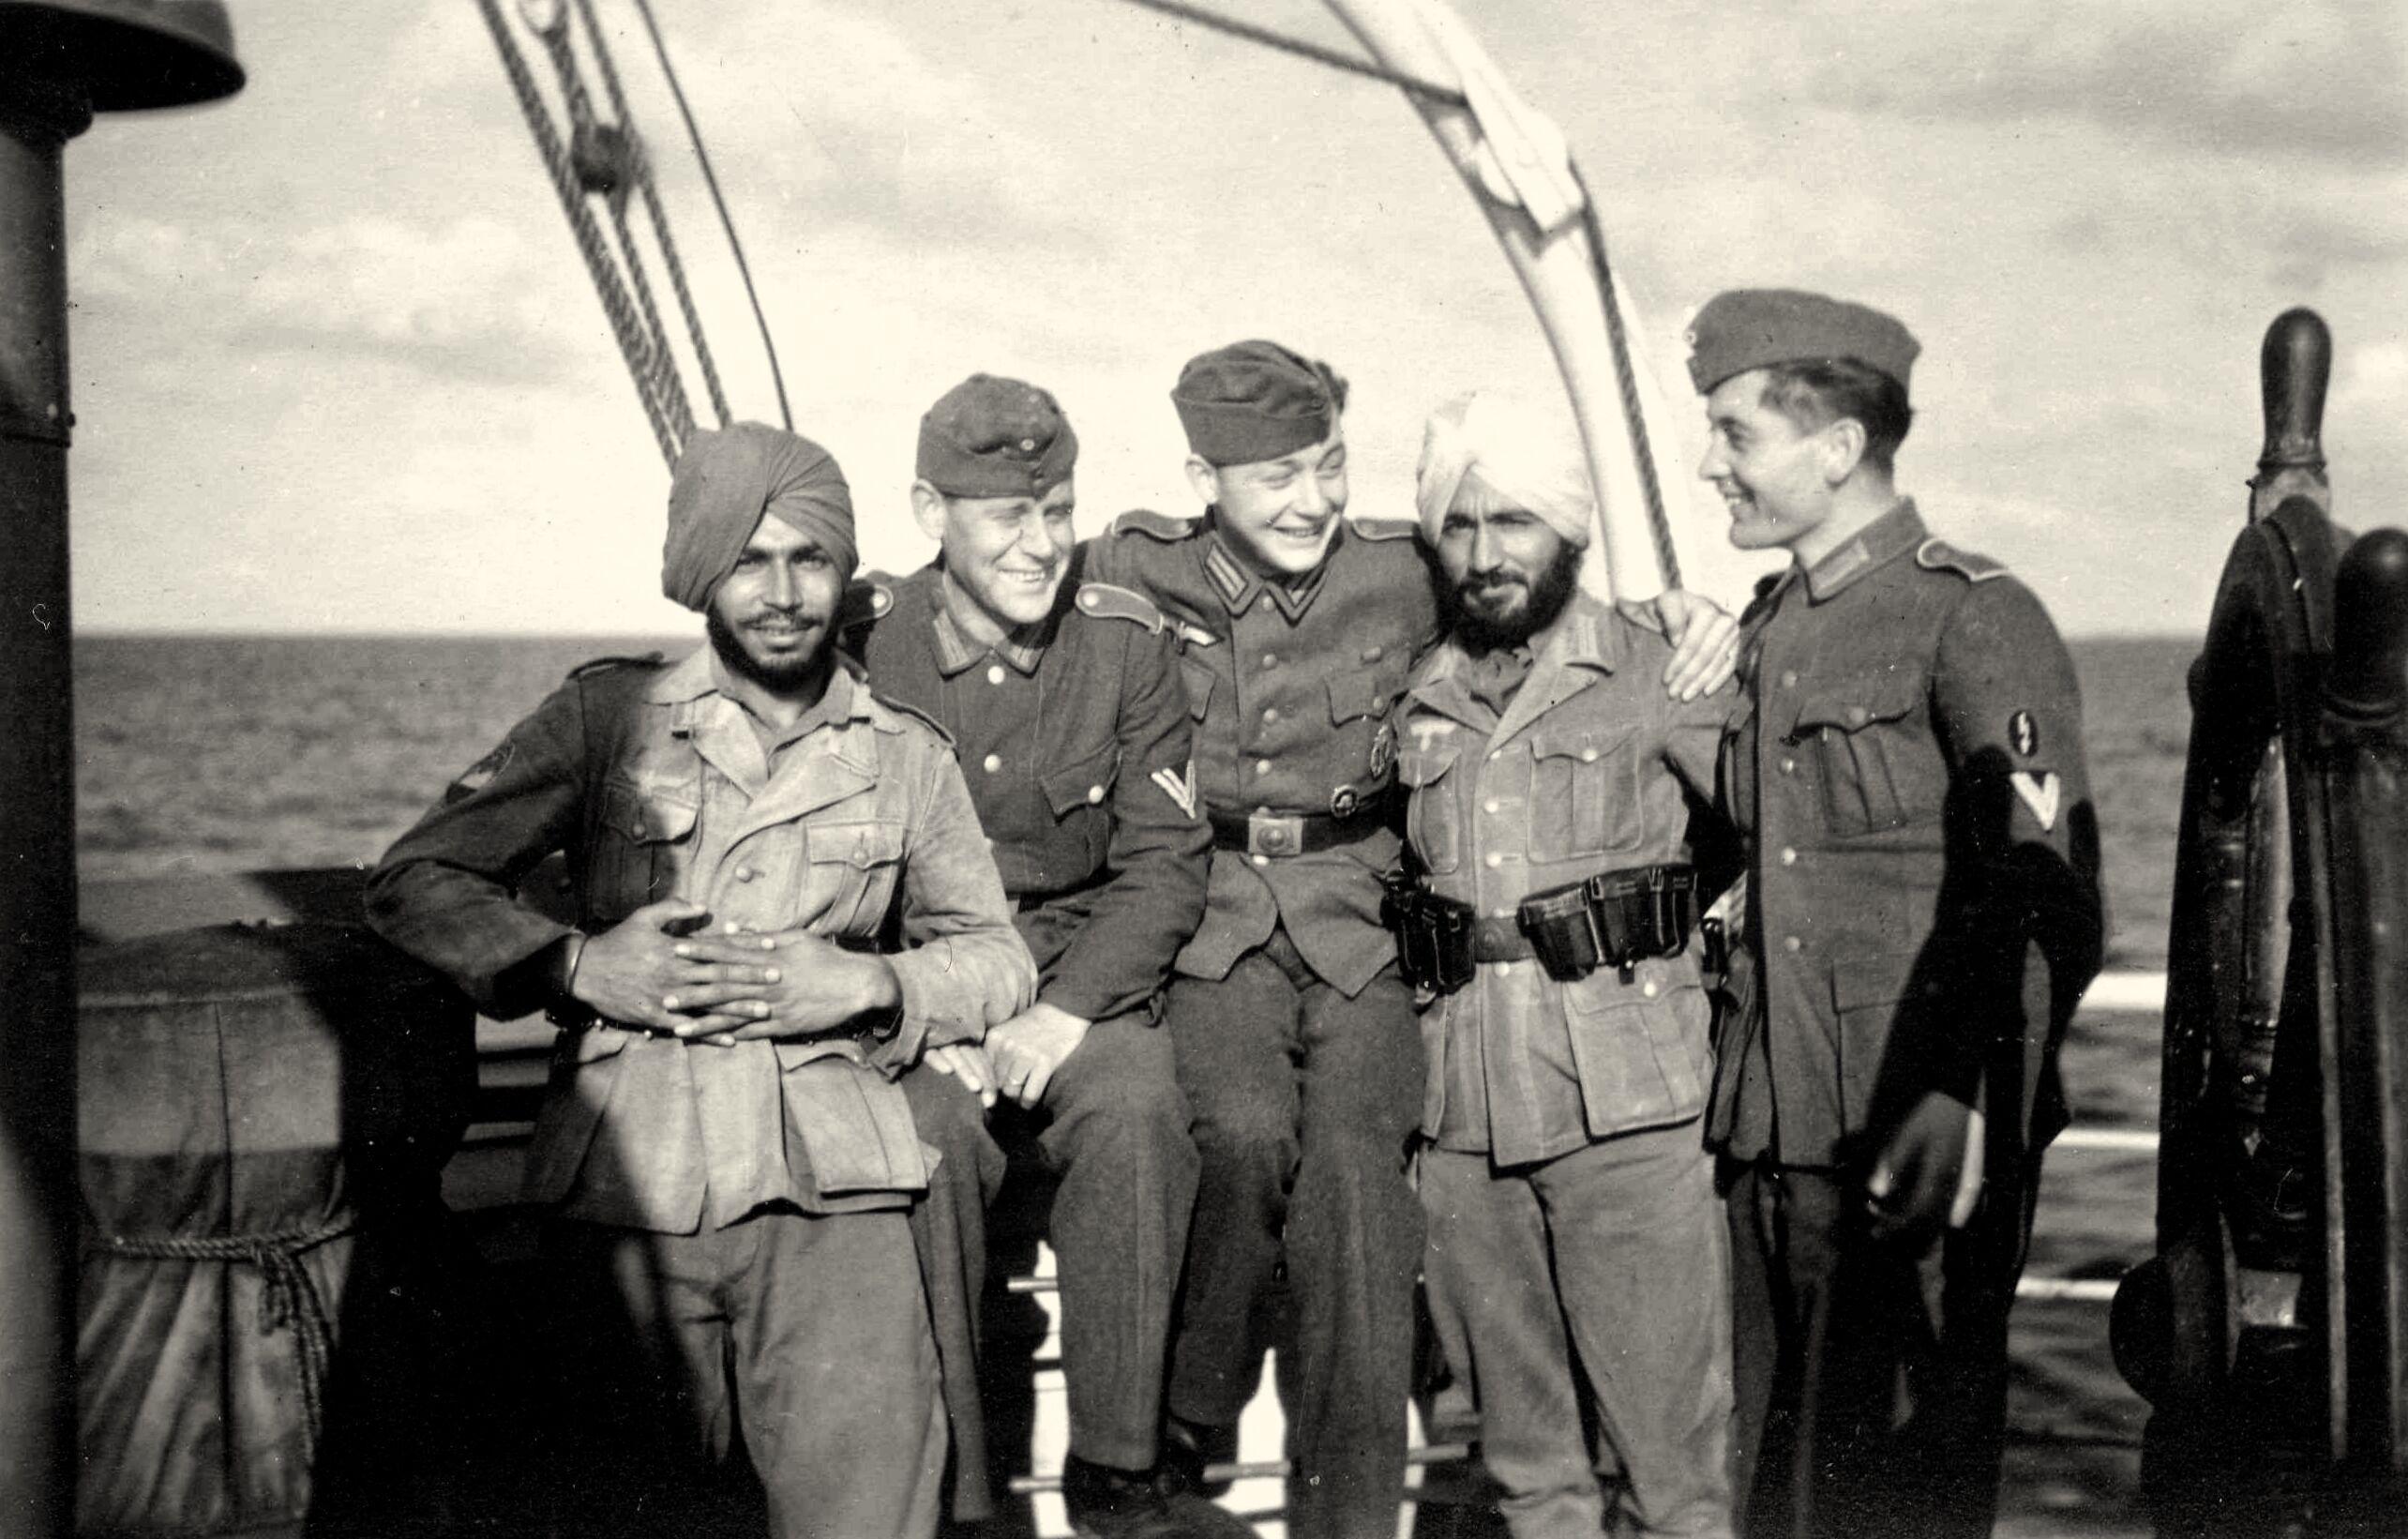 Drieduizend Indiase Sikhs, hindoes en moslims in Duits uniform brachten in bezet Nederland harten op hol